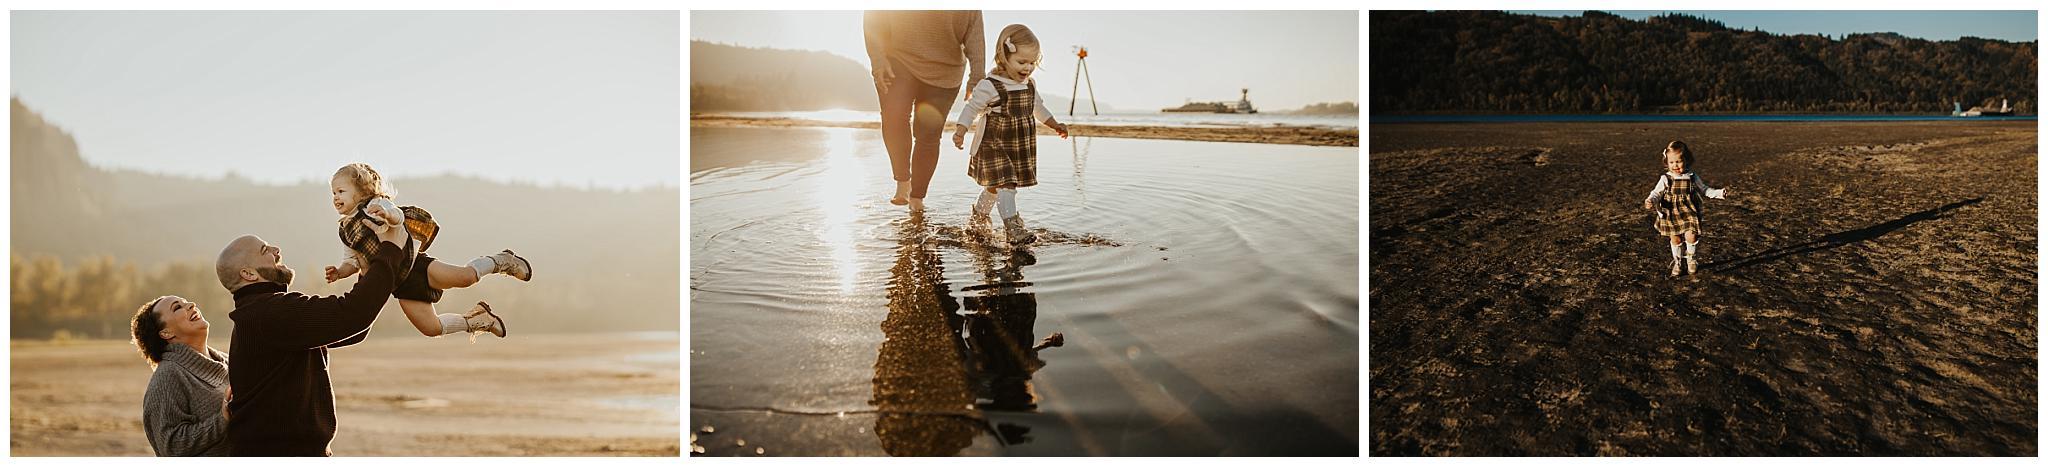 Little girl running and splashing - Portland Photographer